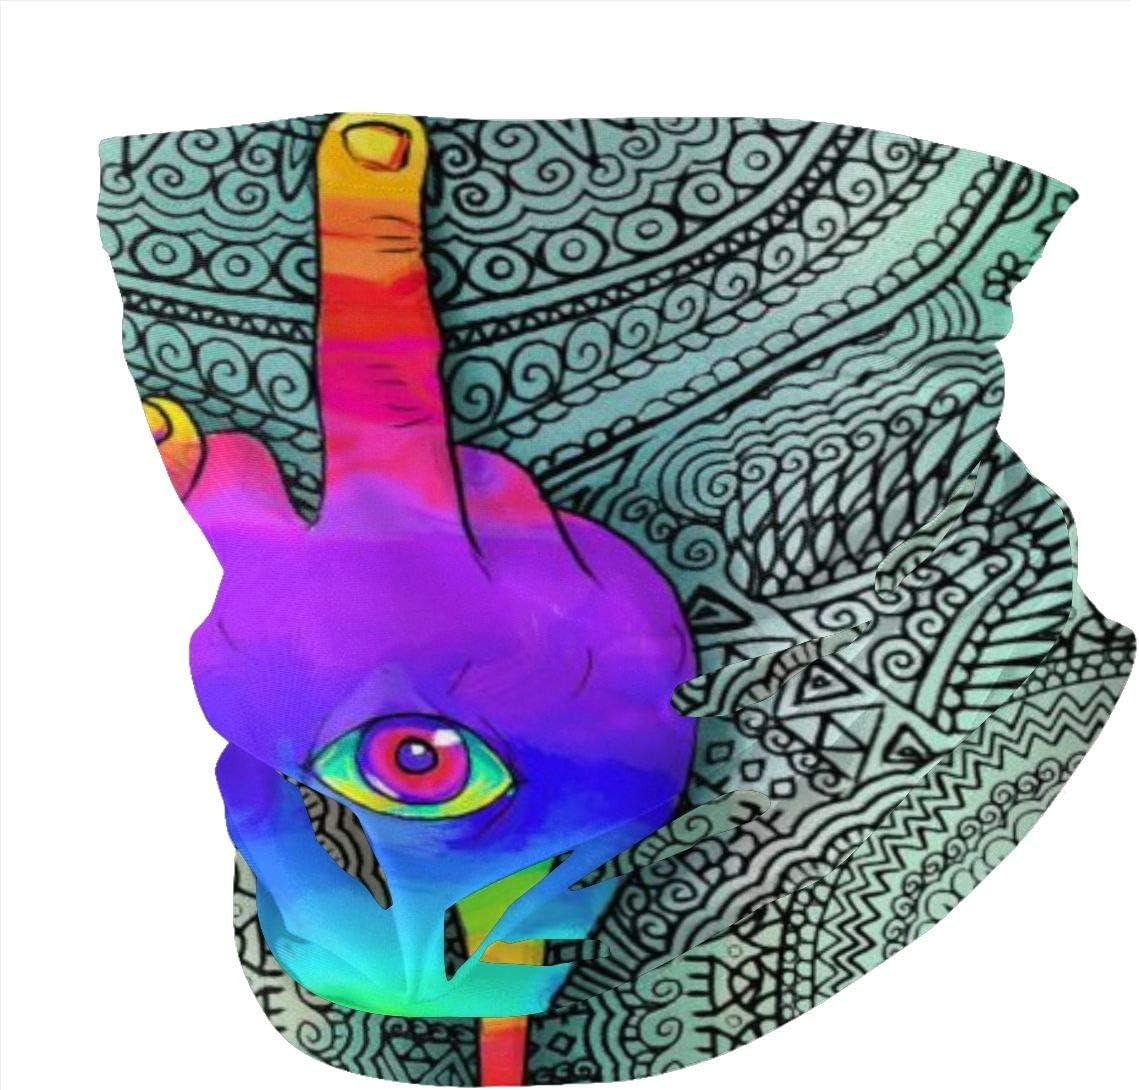 Balaclava Sun Protection Face Mask - Sexy Girl Middle Finger Trippy Mandala Motorcycle Mask Neck Gaiter Neck Gaiter Head Bands Neck Warmer Men Headband Neck Gaiter